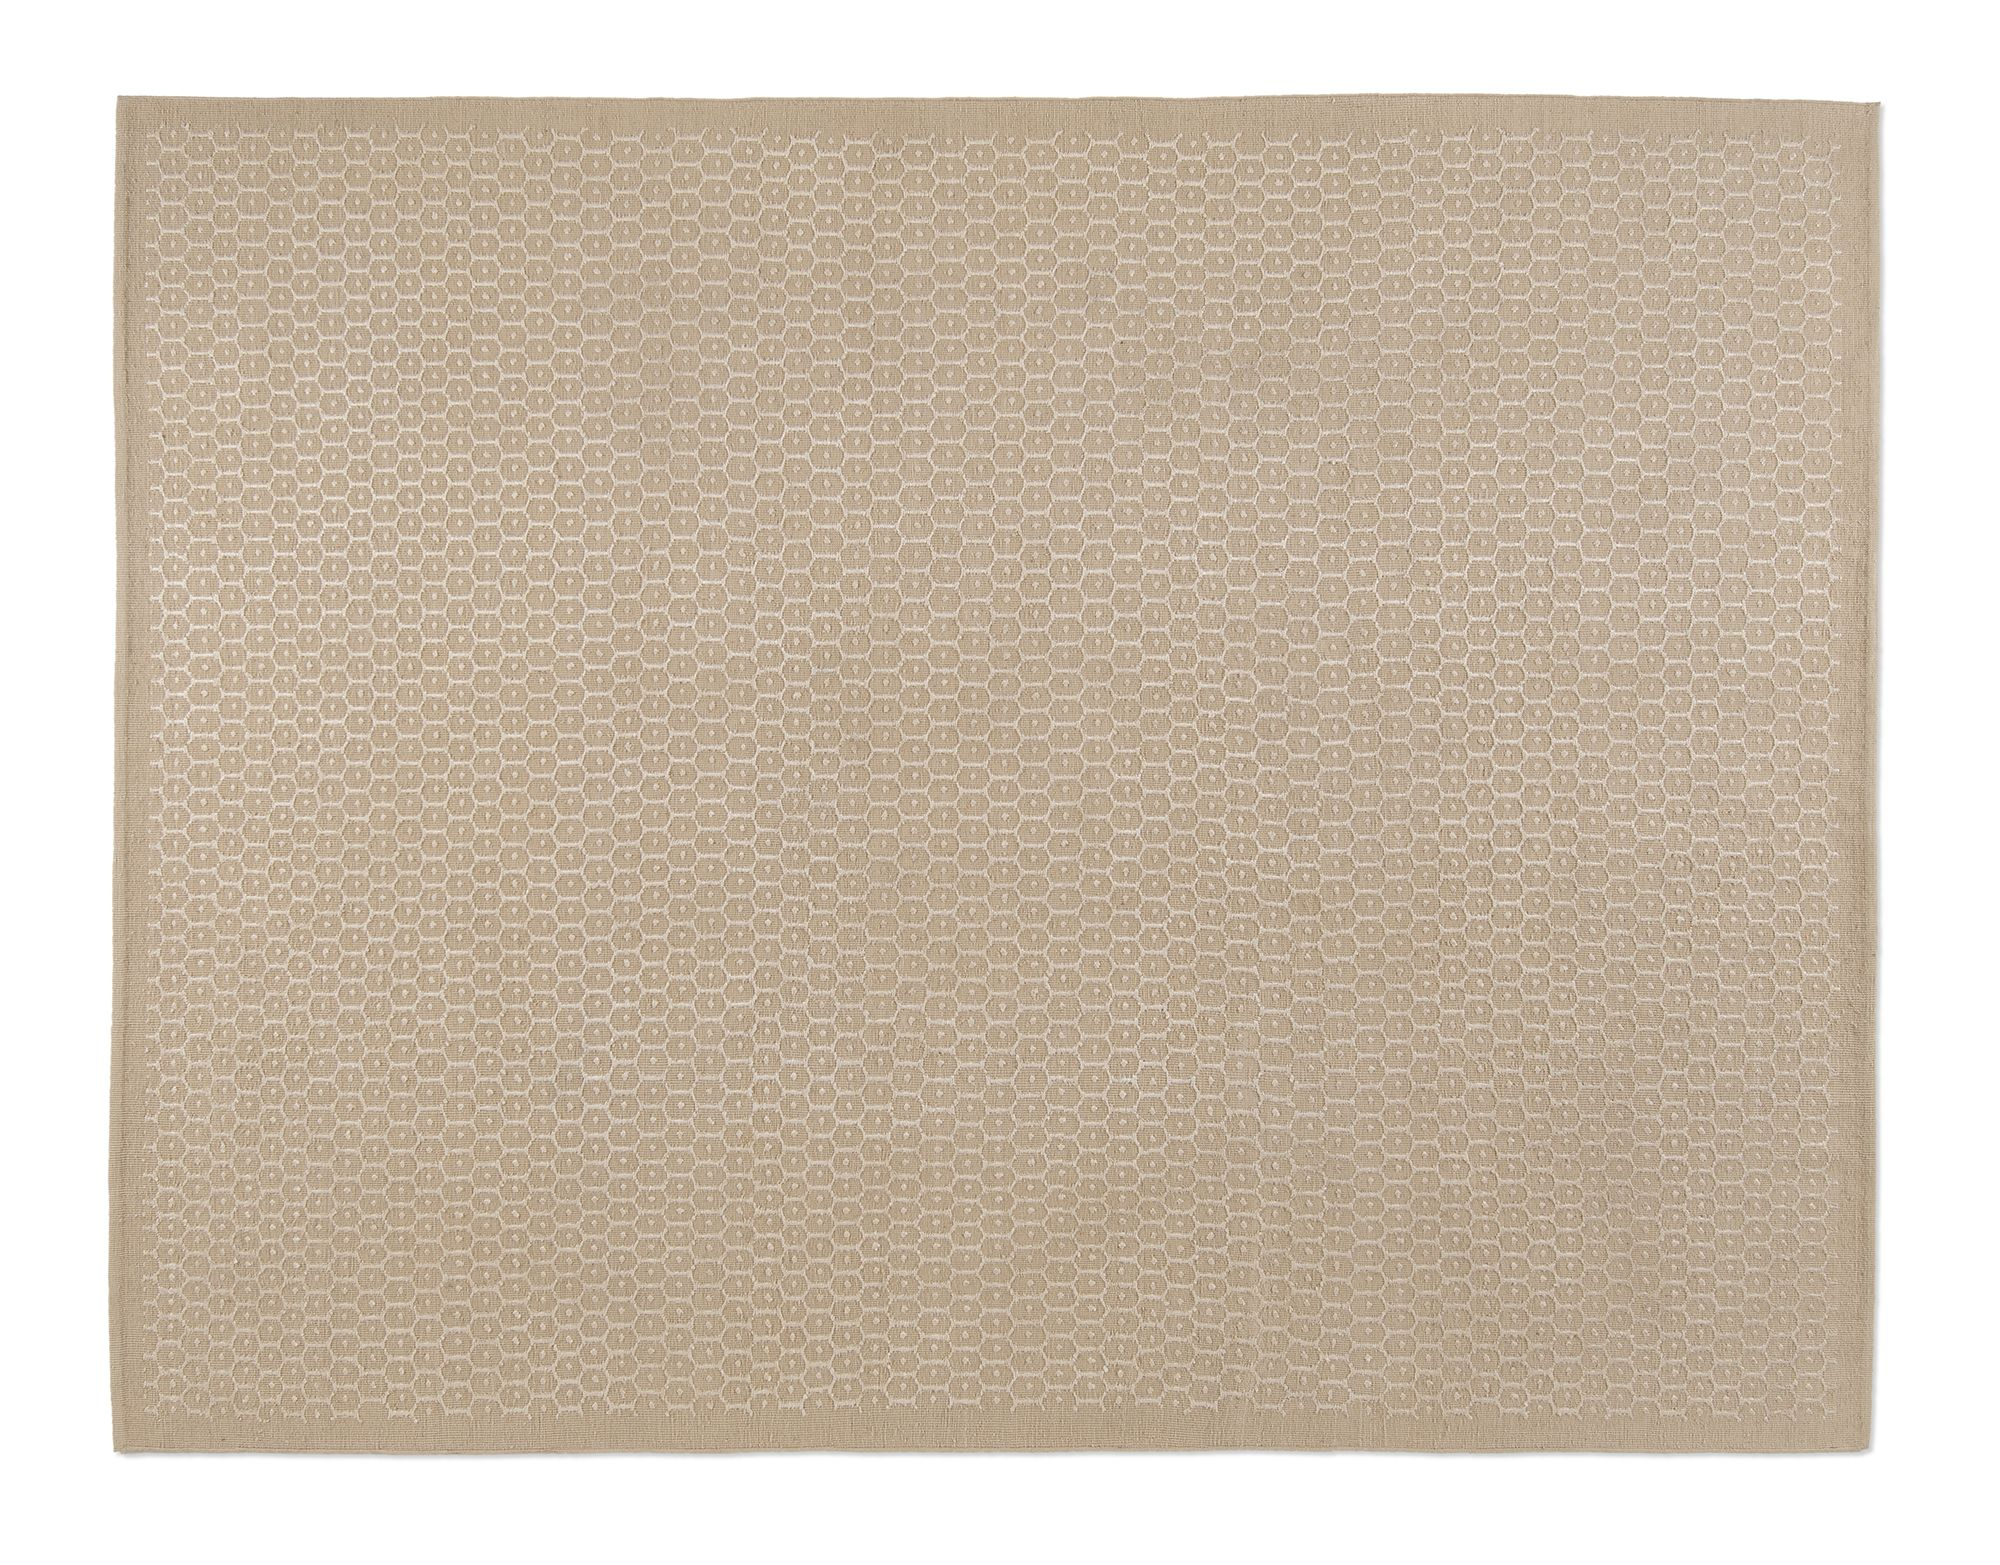 Kumo Carpet Collection, Minamo, Living Divani, 2016